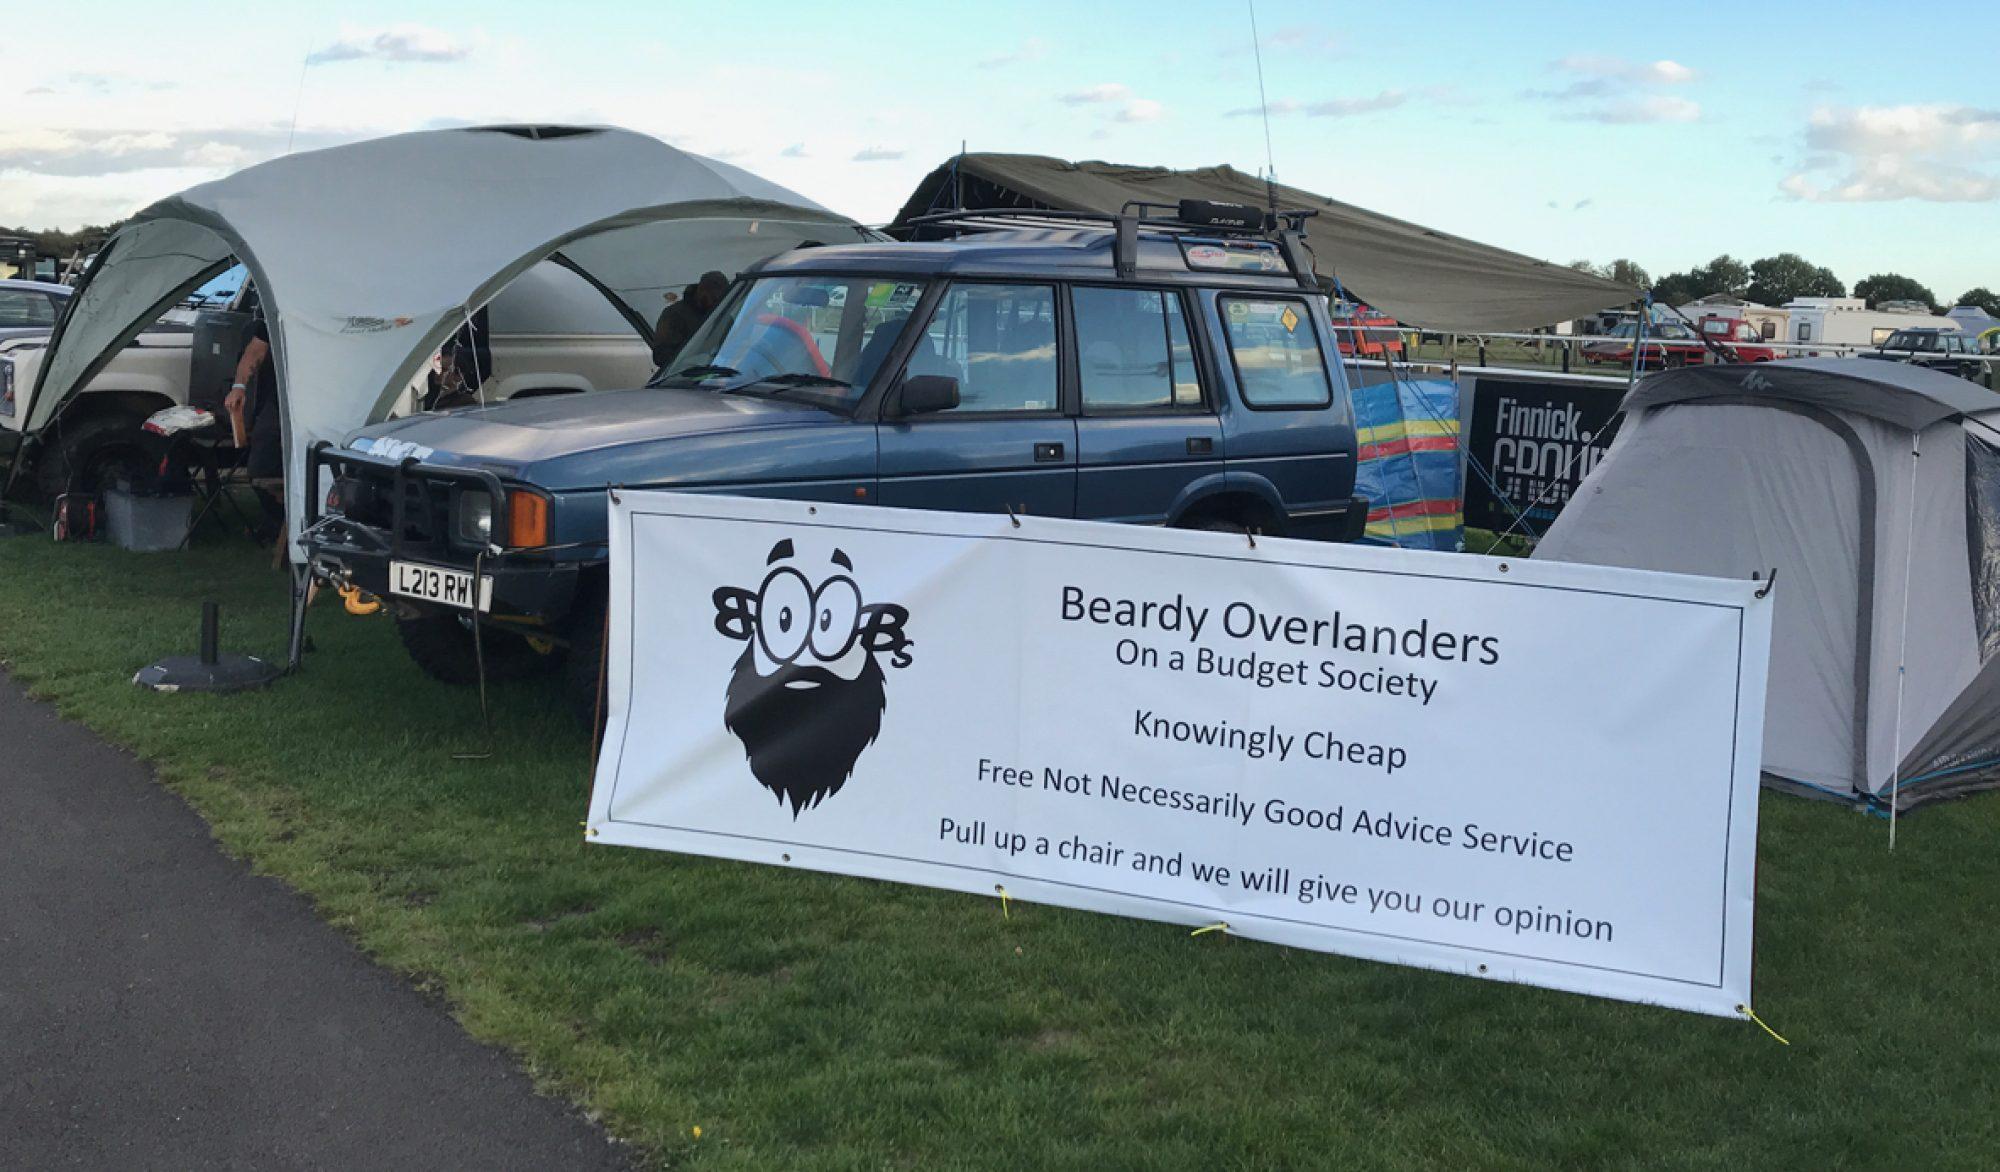 Beardy Overlanders On a Budget Society